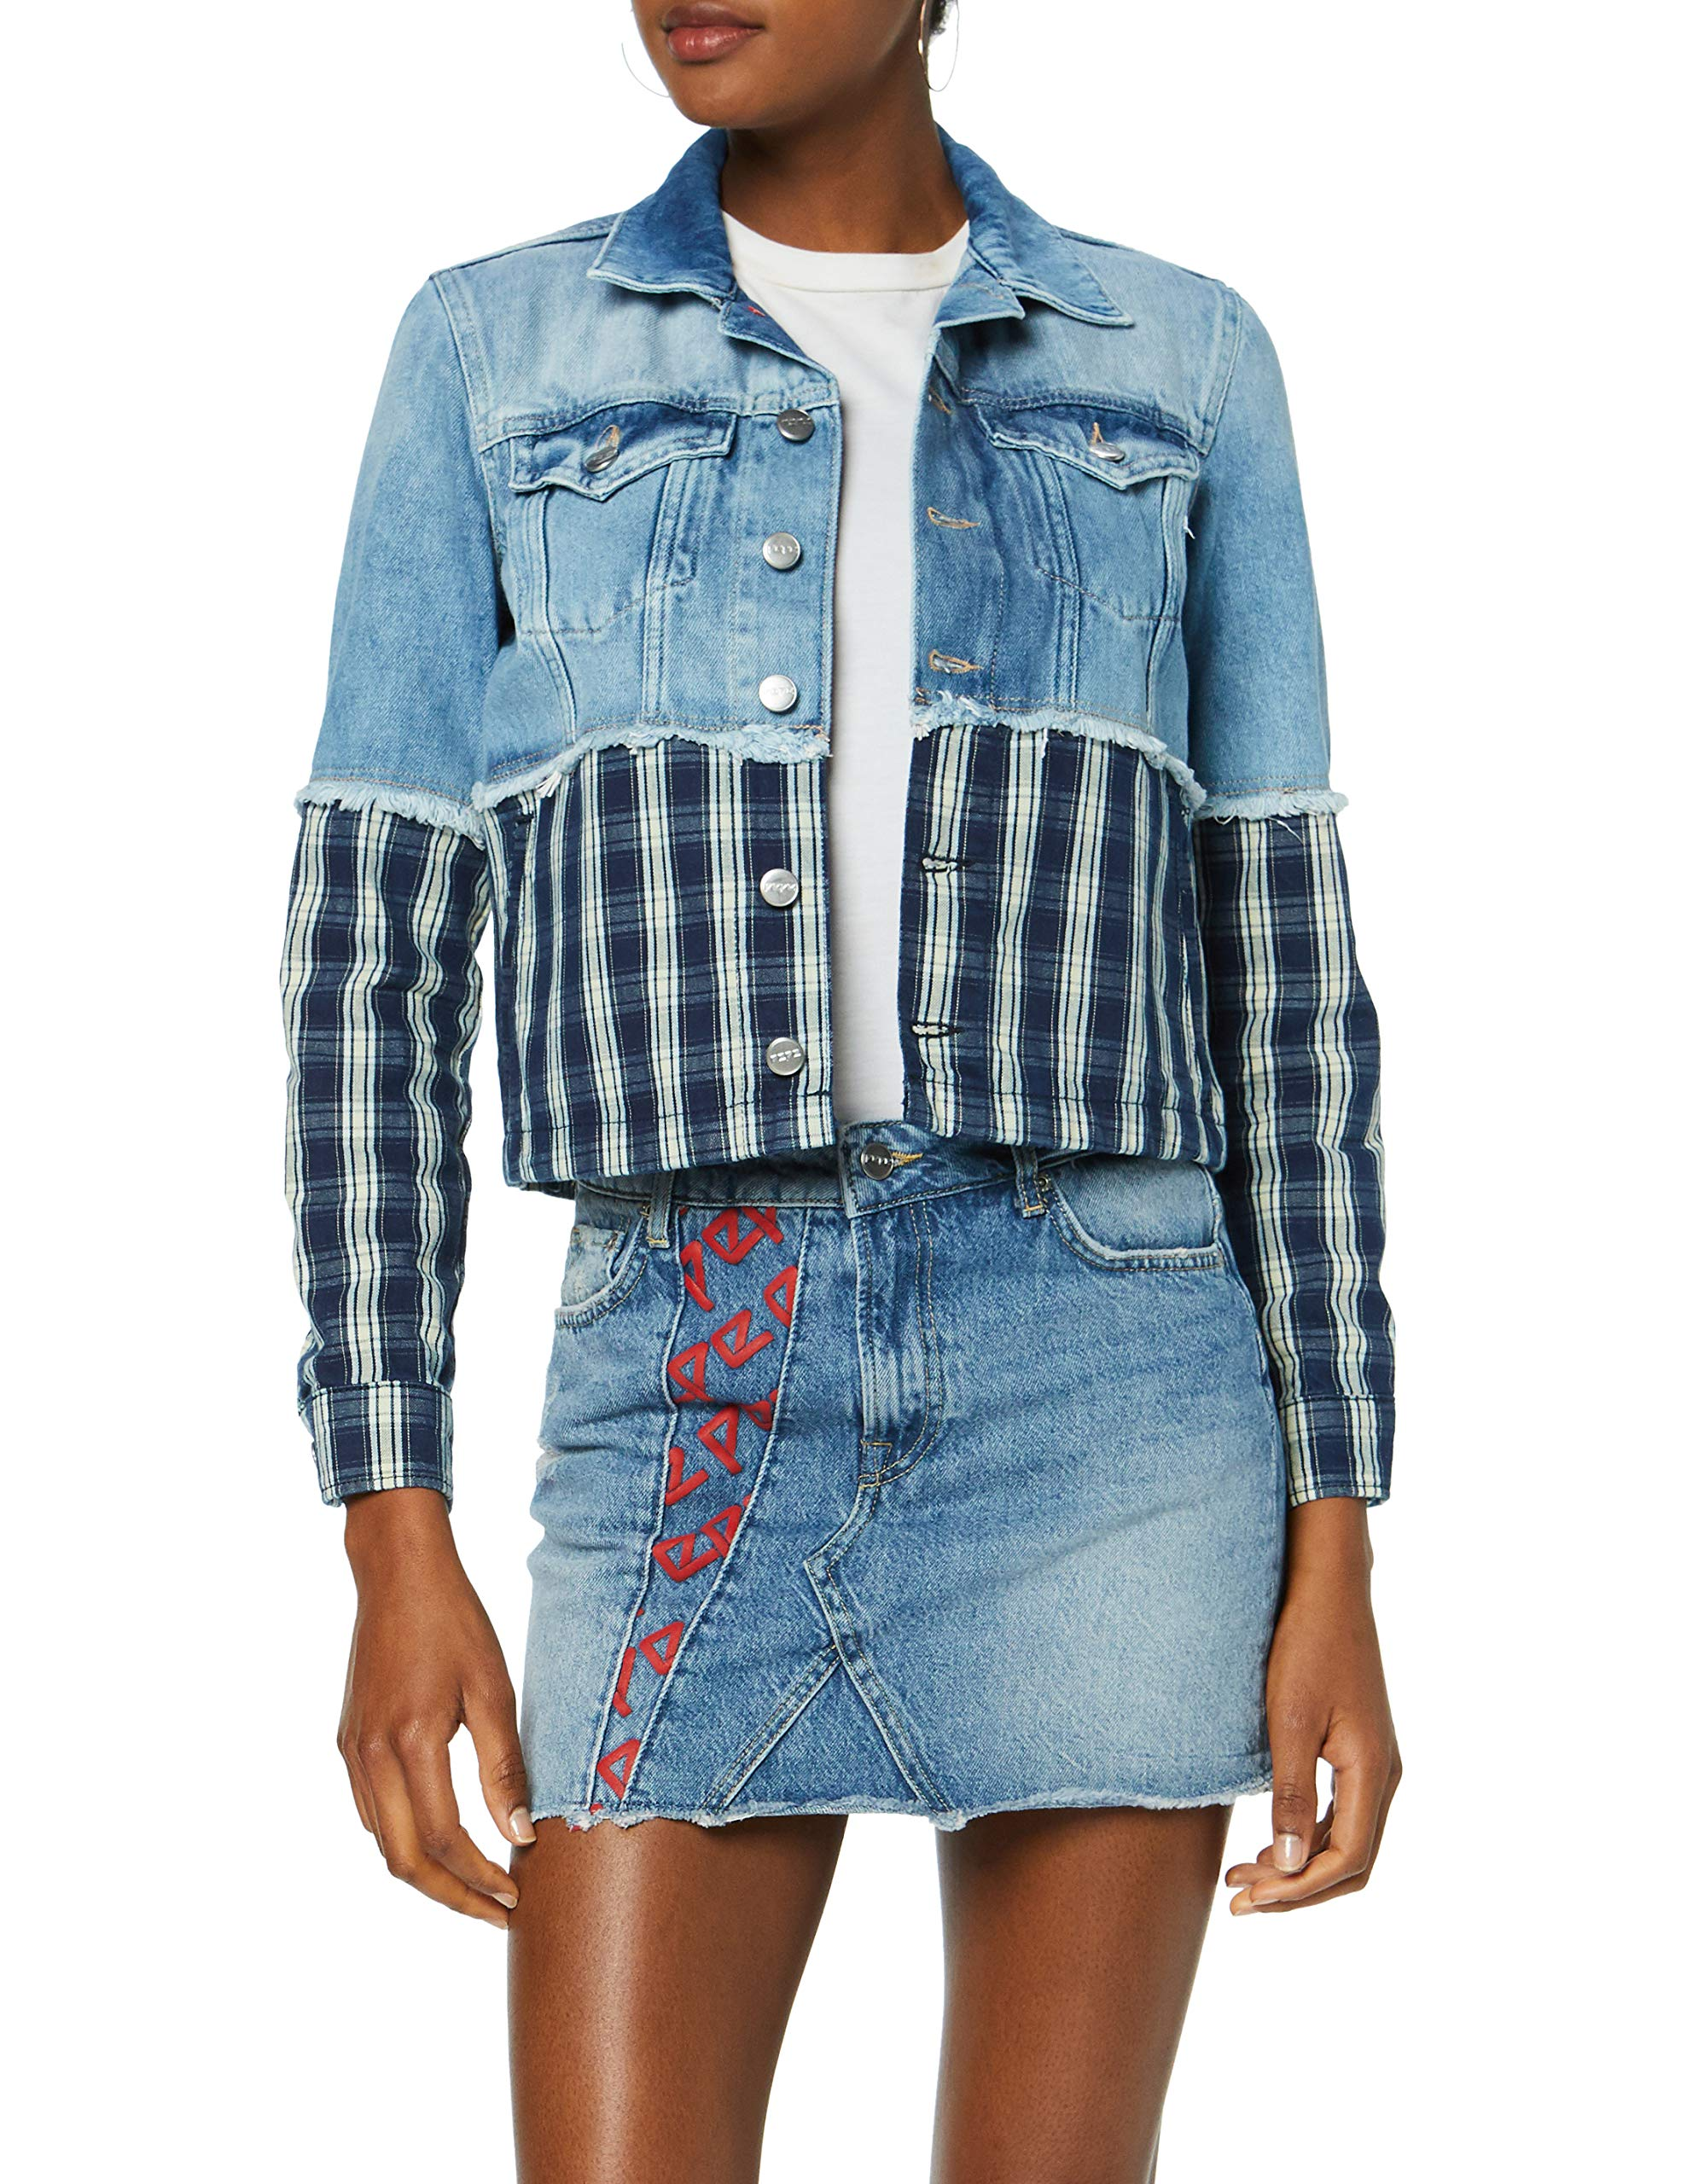 Pl401684 s FemmeBleu11oz Blouson Mix Denim Fabricant Check Jeans Pepe Jess 000Smalltaille 80NmnwOyv